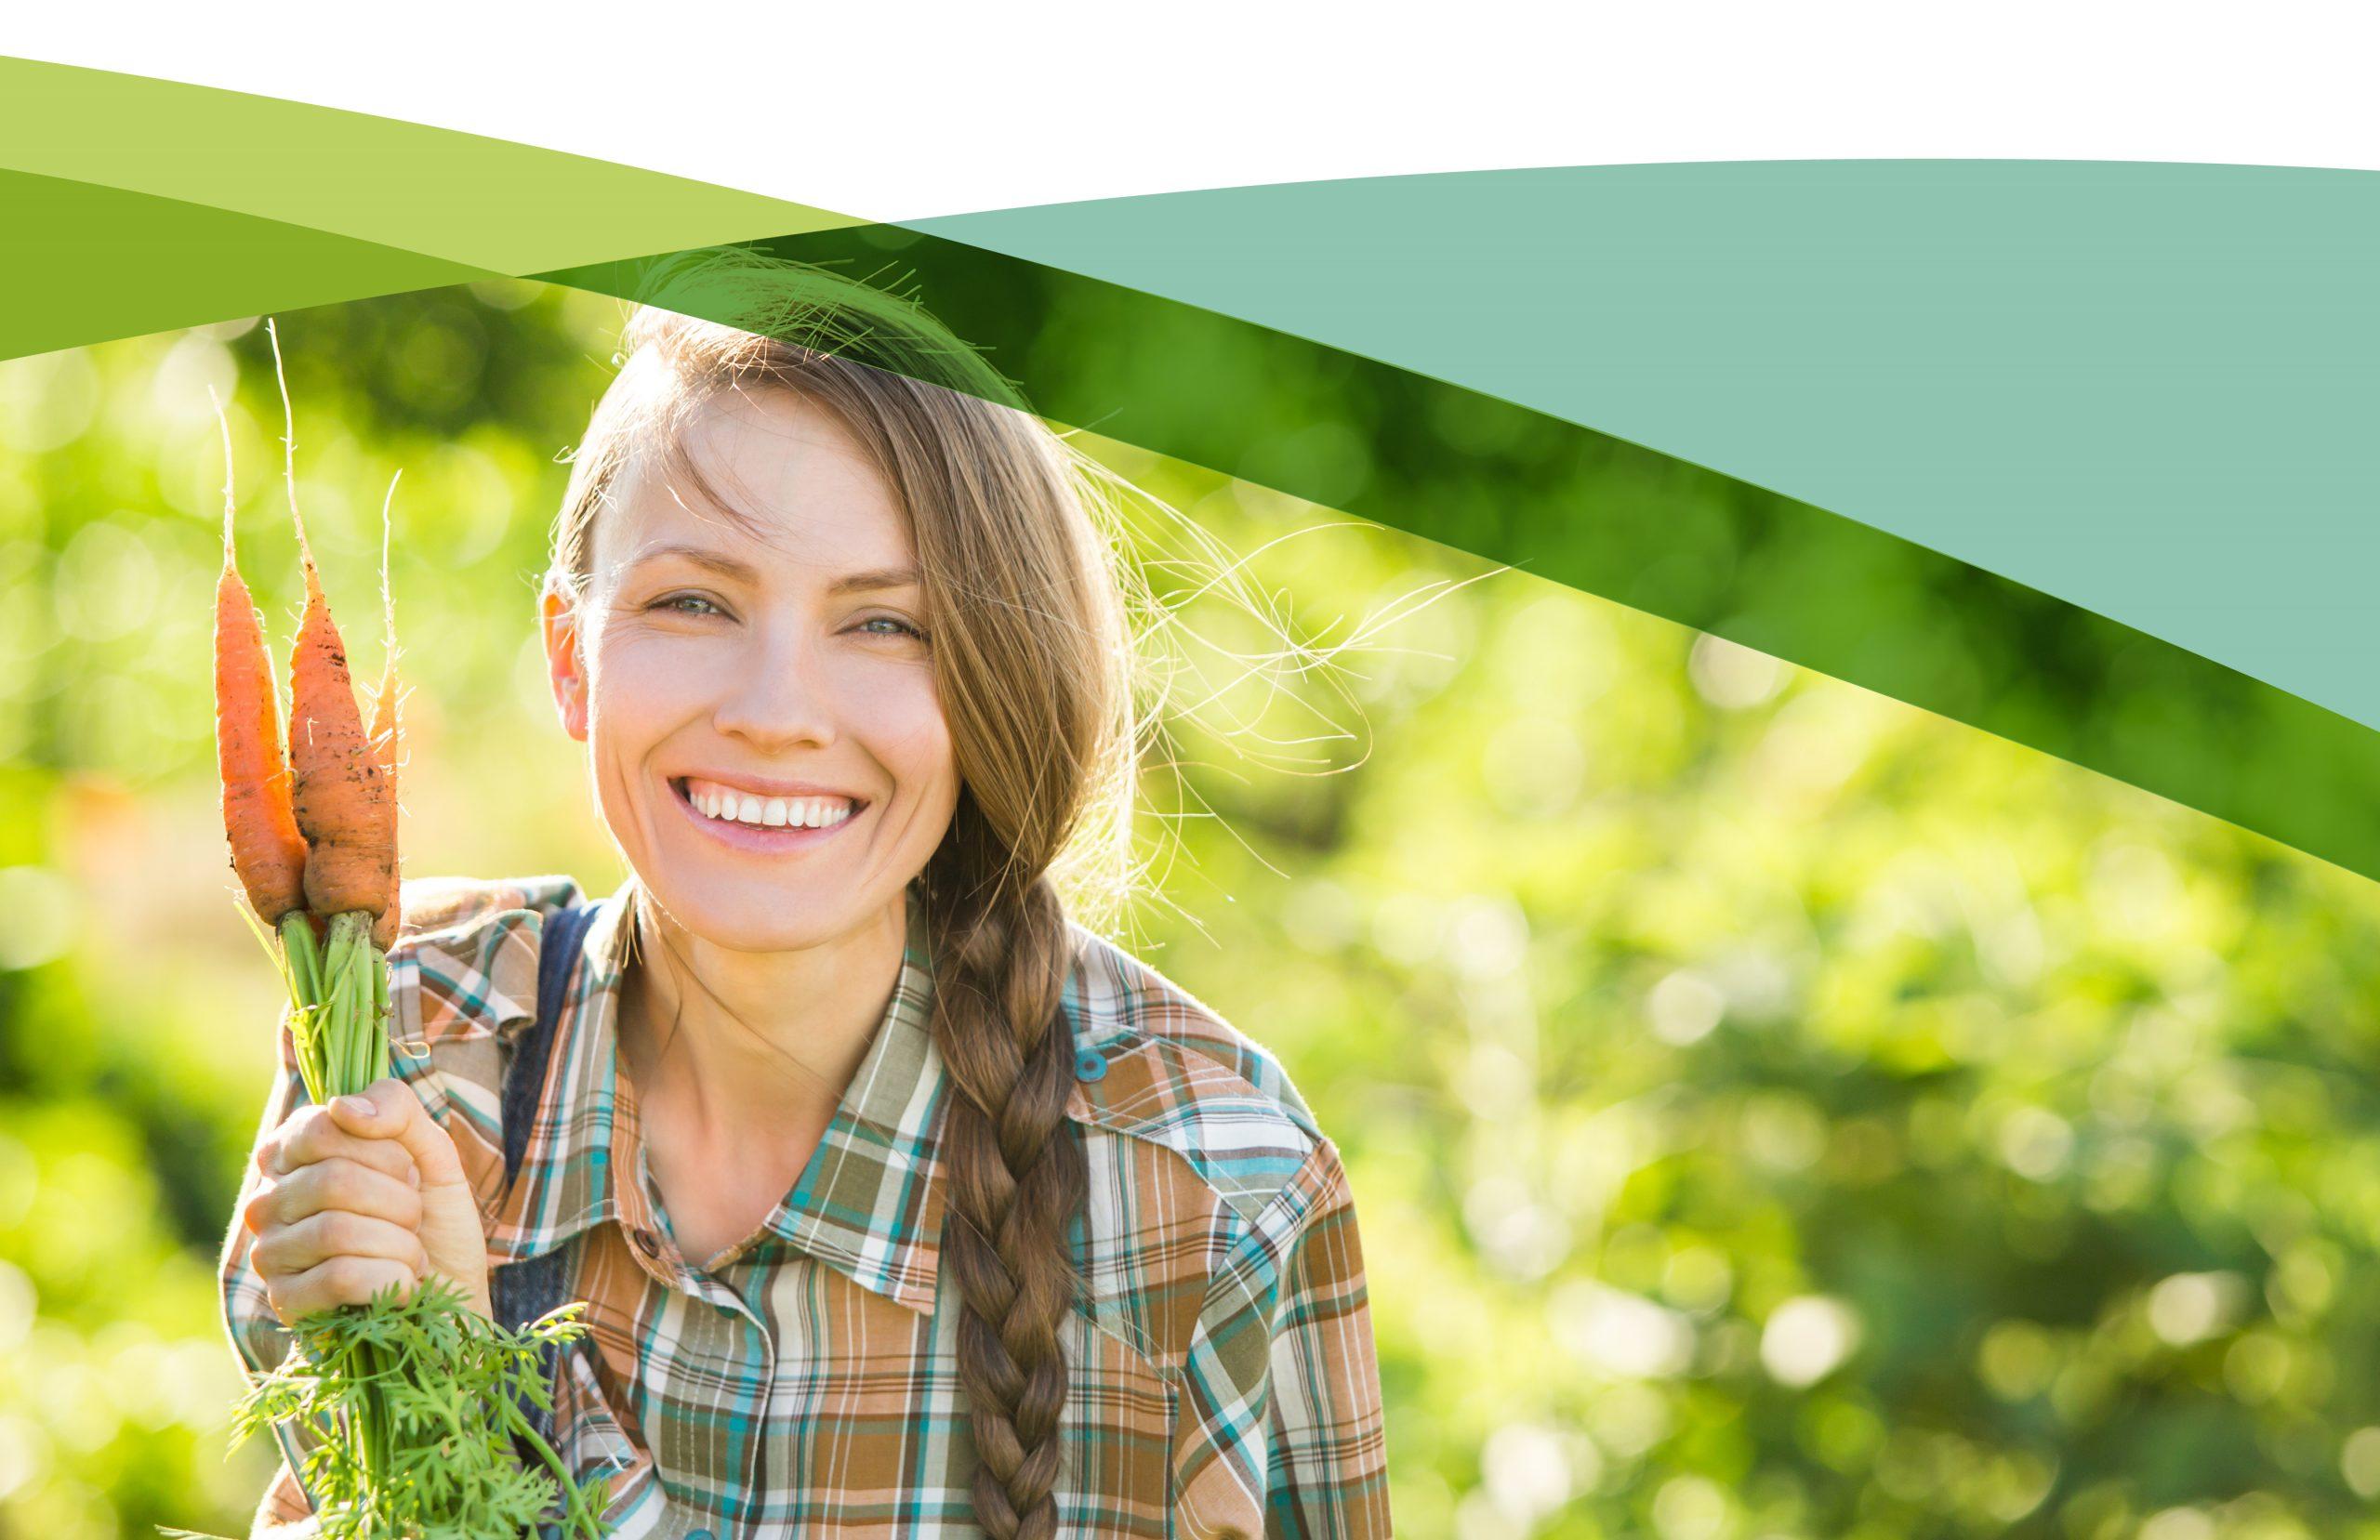 Landesverband Gartenbau NRW: Marken-Relaunch, Key Visual-Entwicklung